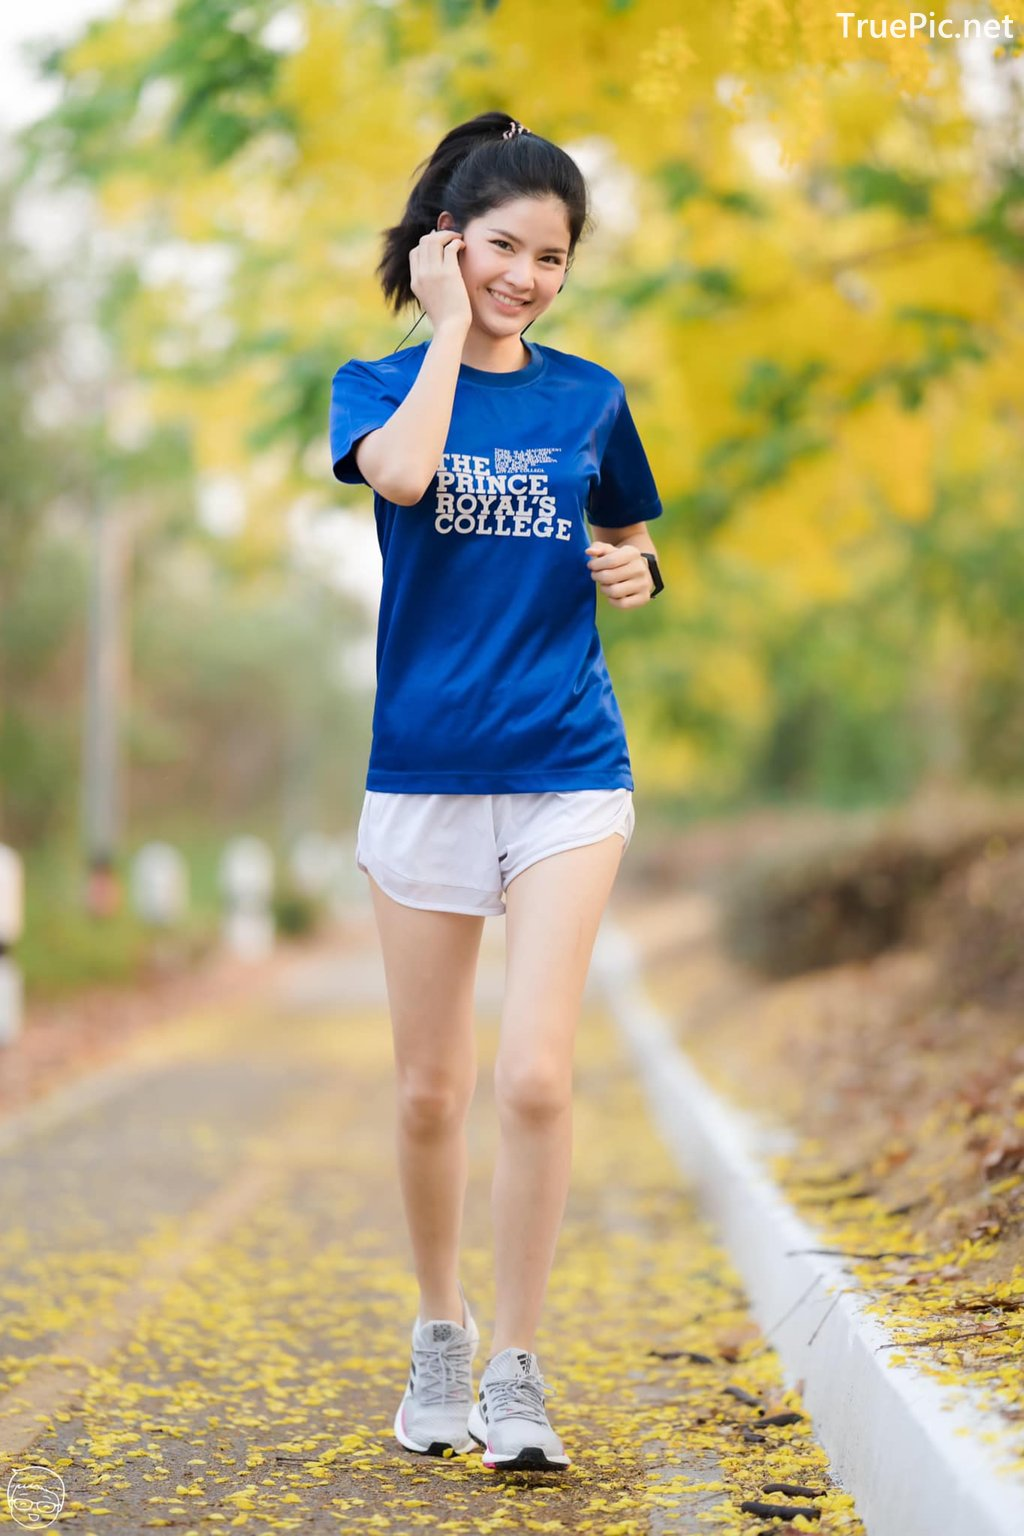 Image Thailand Model - Nuttacha Chayangkanont - Fun & Run - TruePic.net - Picture-5